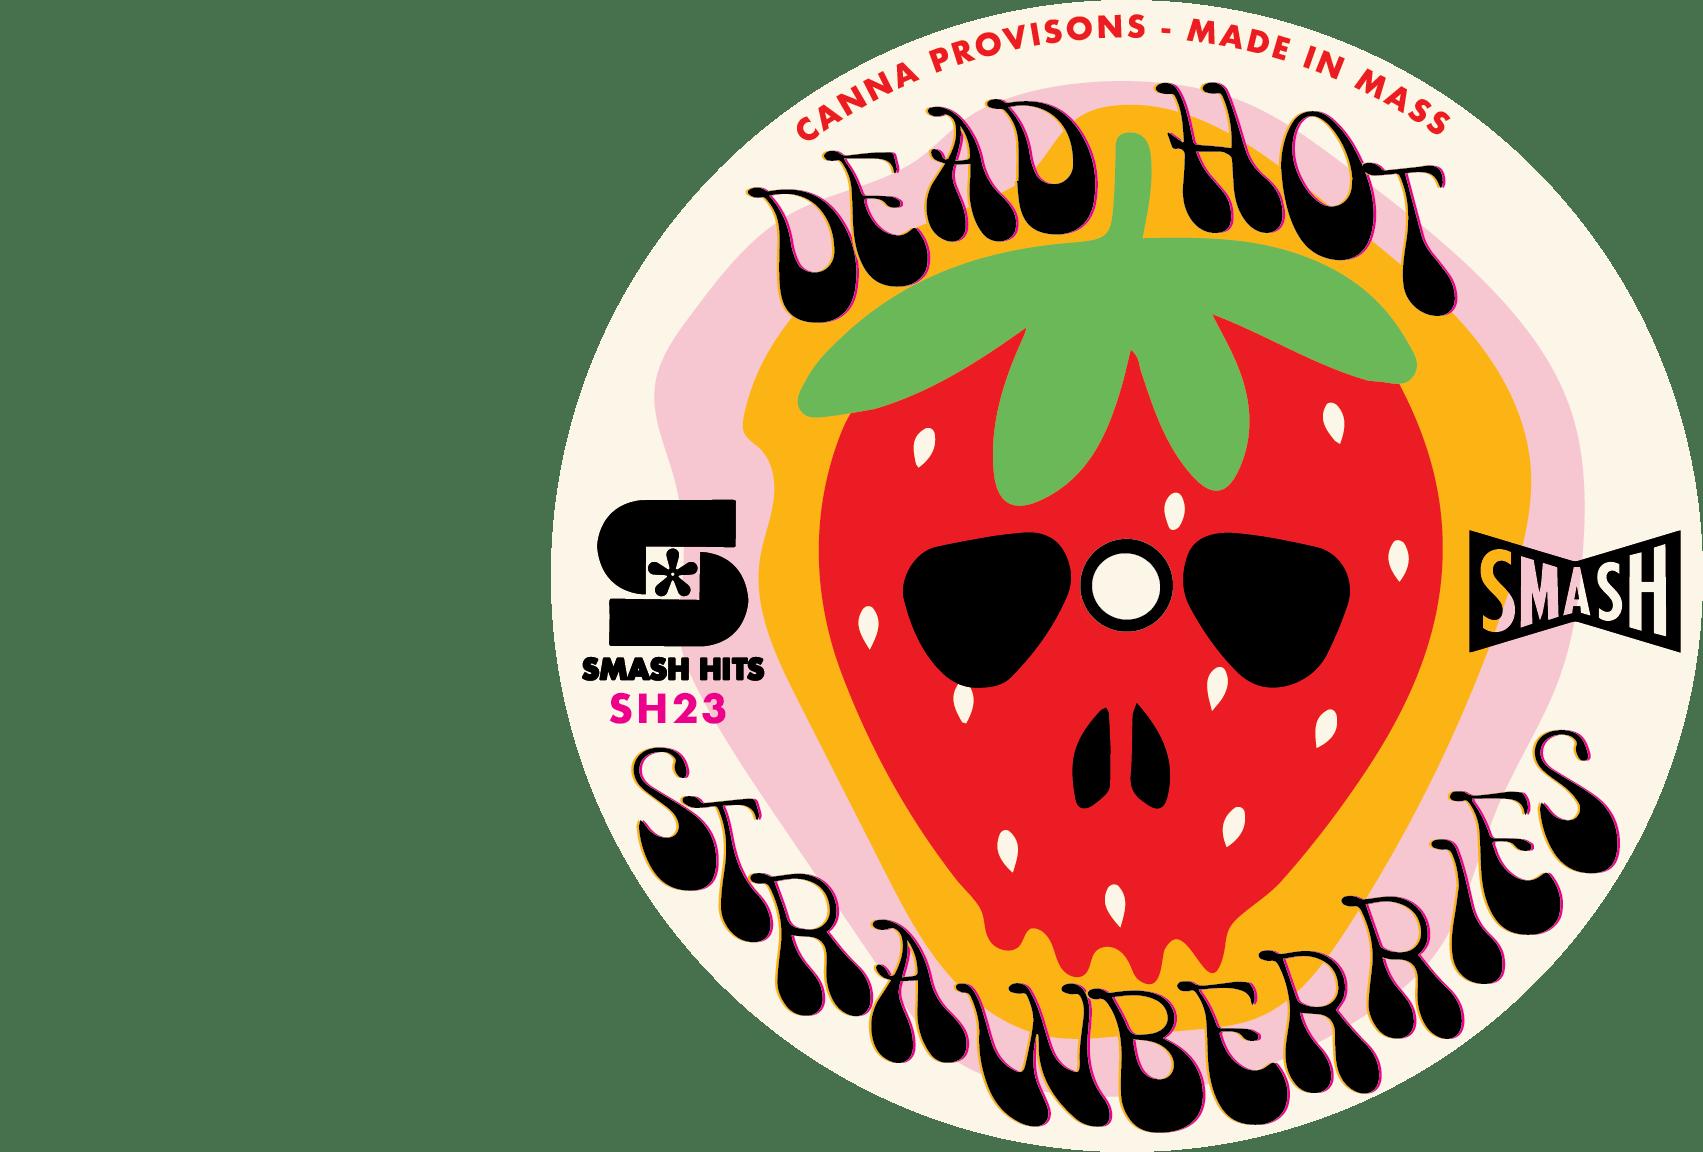 Dead Hot Strawberries